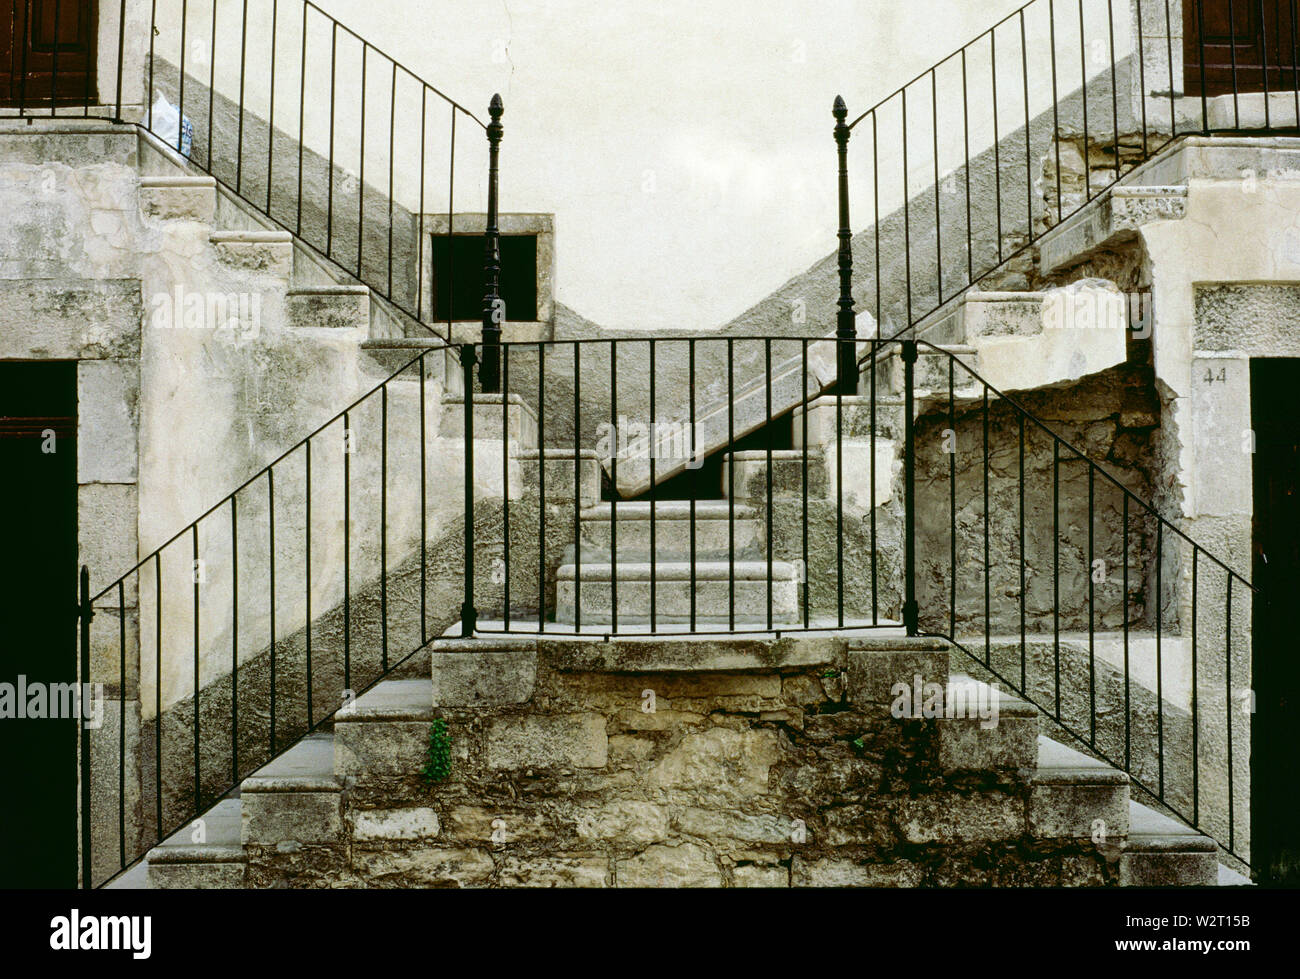 Vignale, ancient architectures in Pescocostanzo - Stock Image